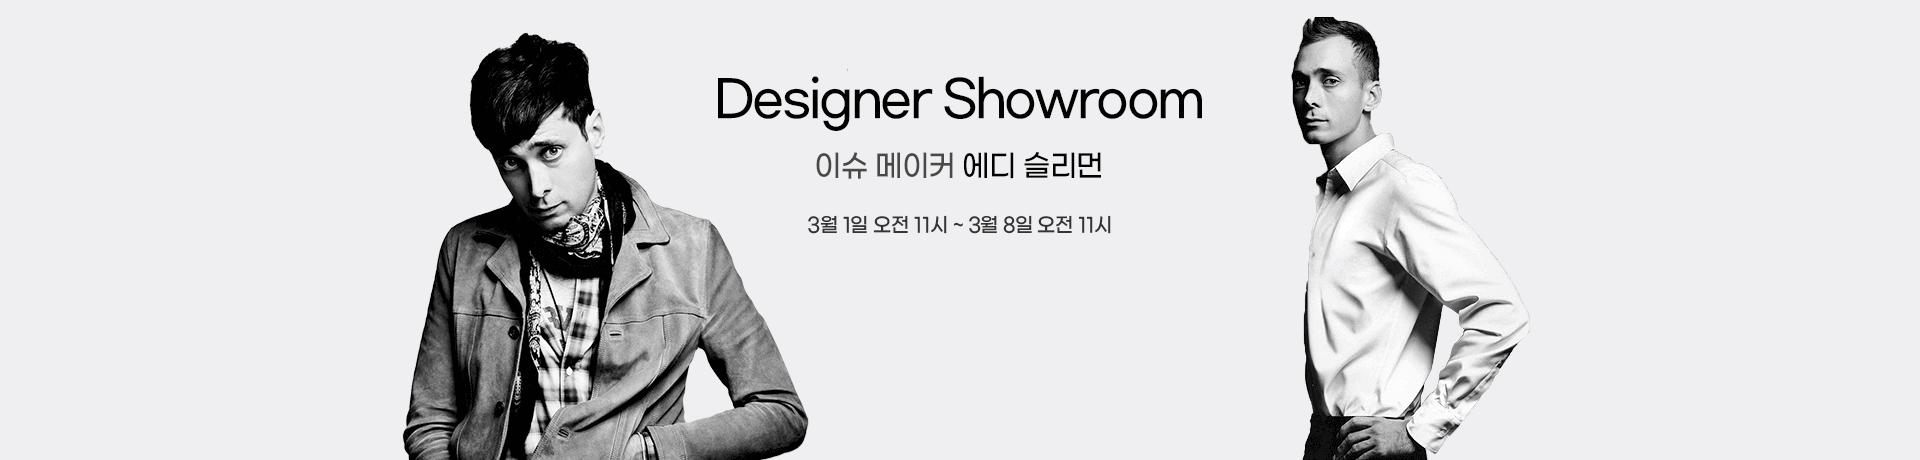 210301_yh_designer-showroom_pc_efeff1